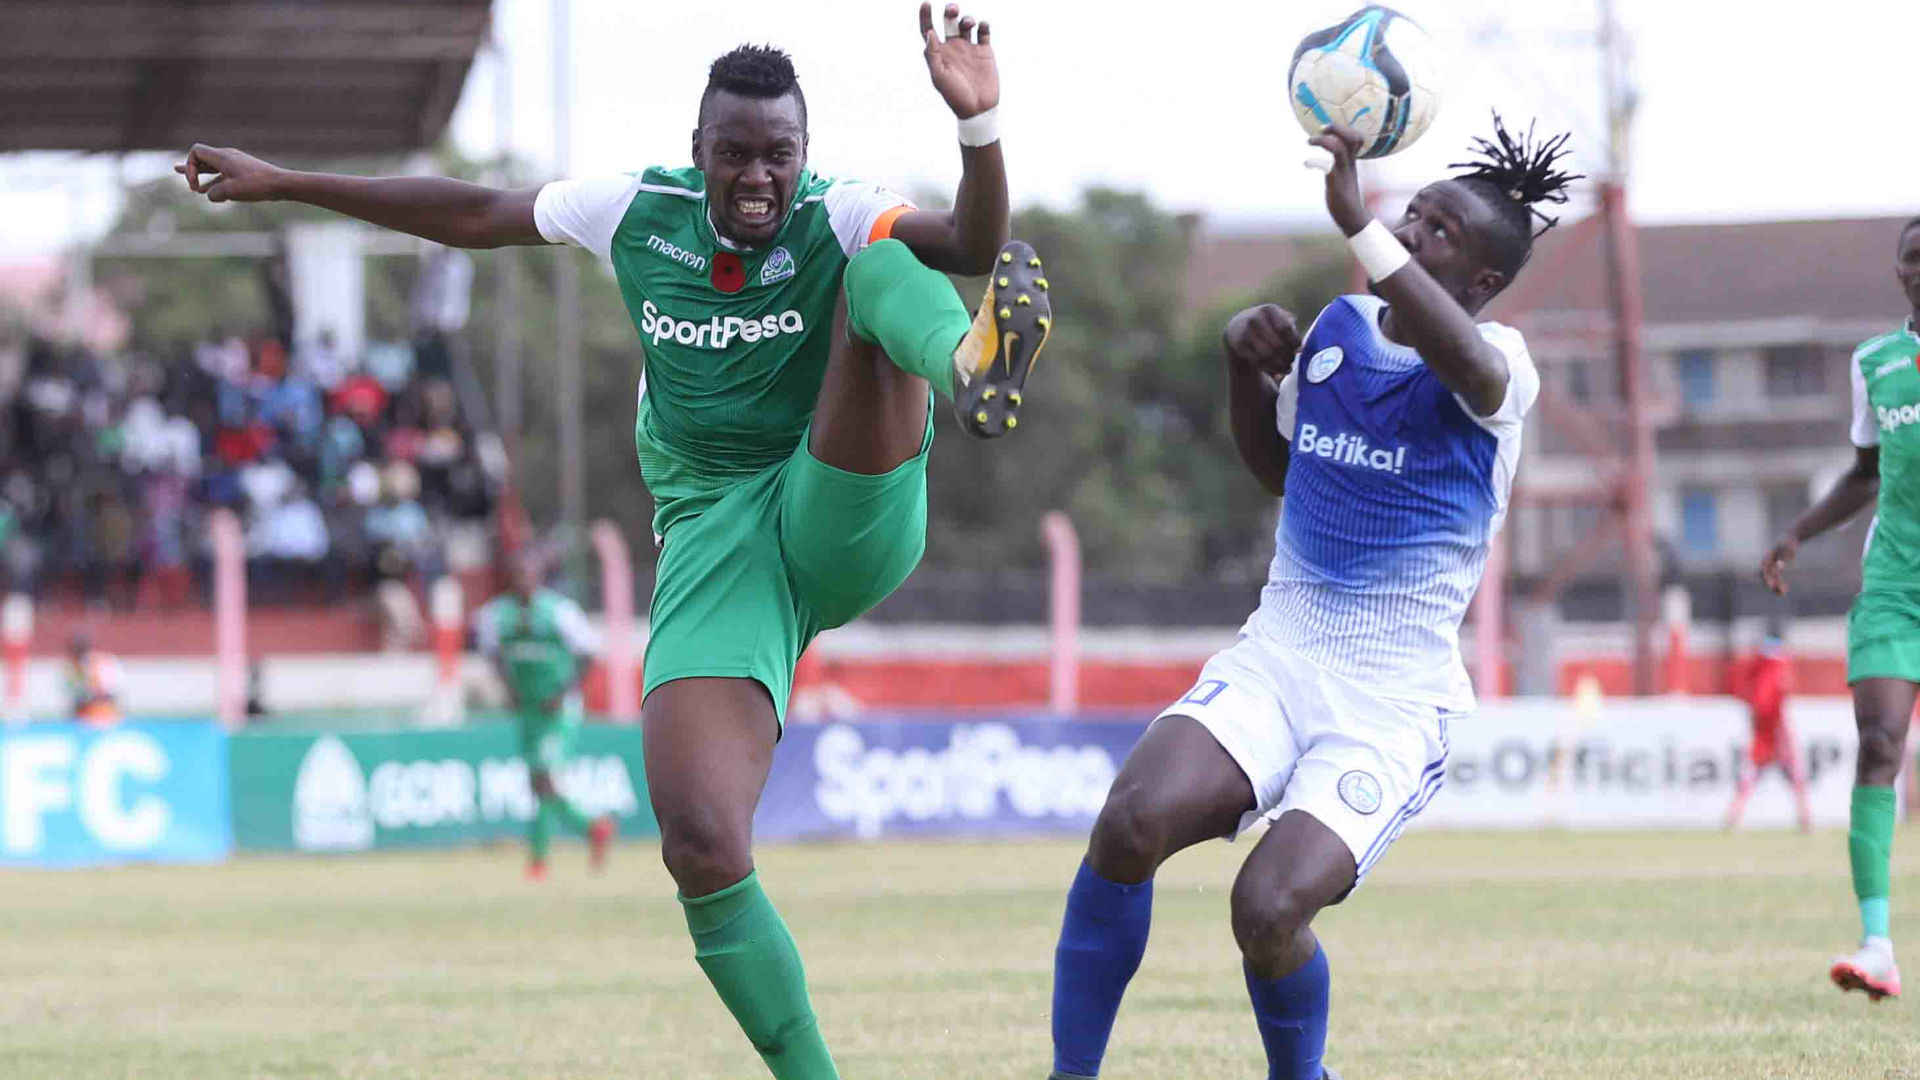 Caf Confederation Cup: Shakava and Gor Mahia stars who can hurt Al-Ahly Merowe